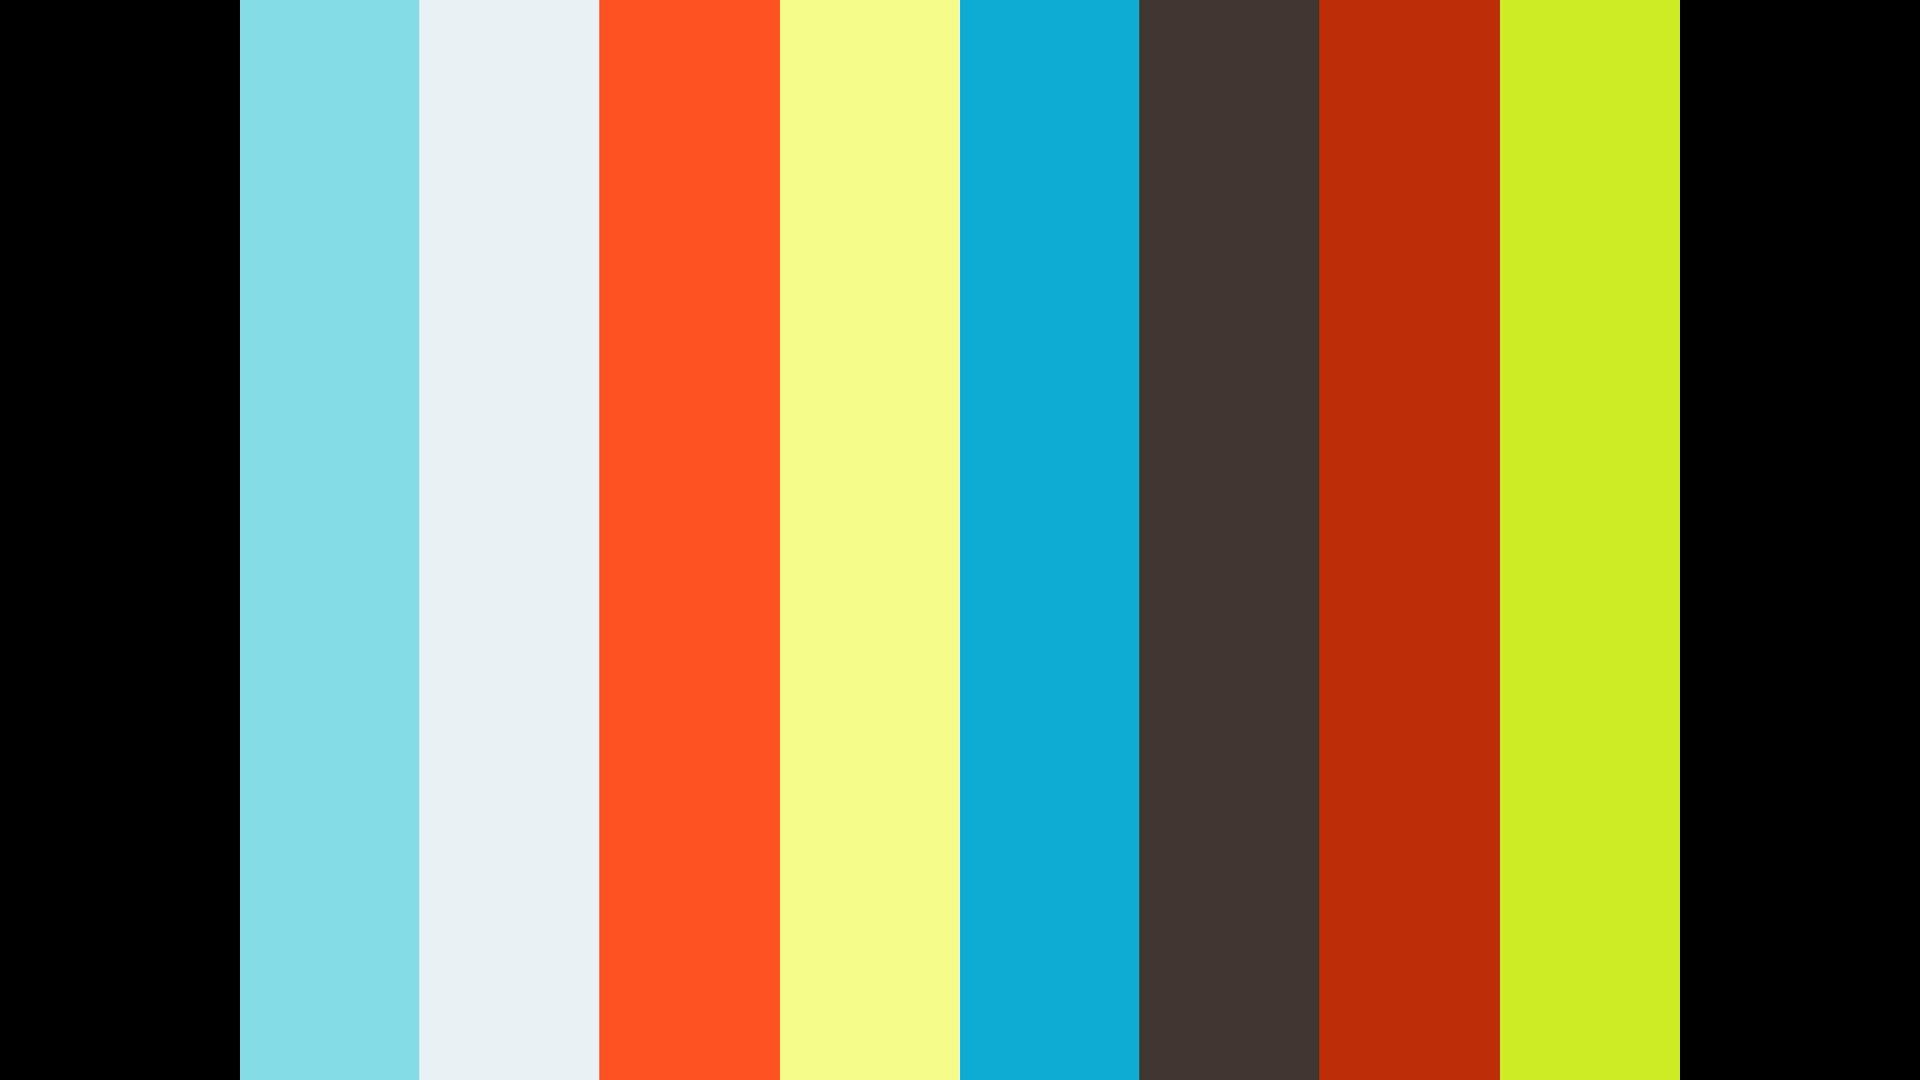 Directorial Trademarks: Denis Villeneuve